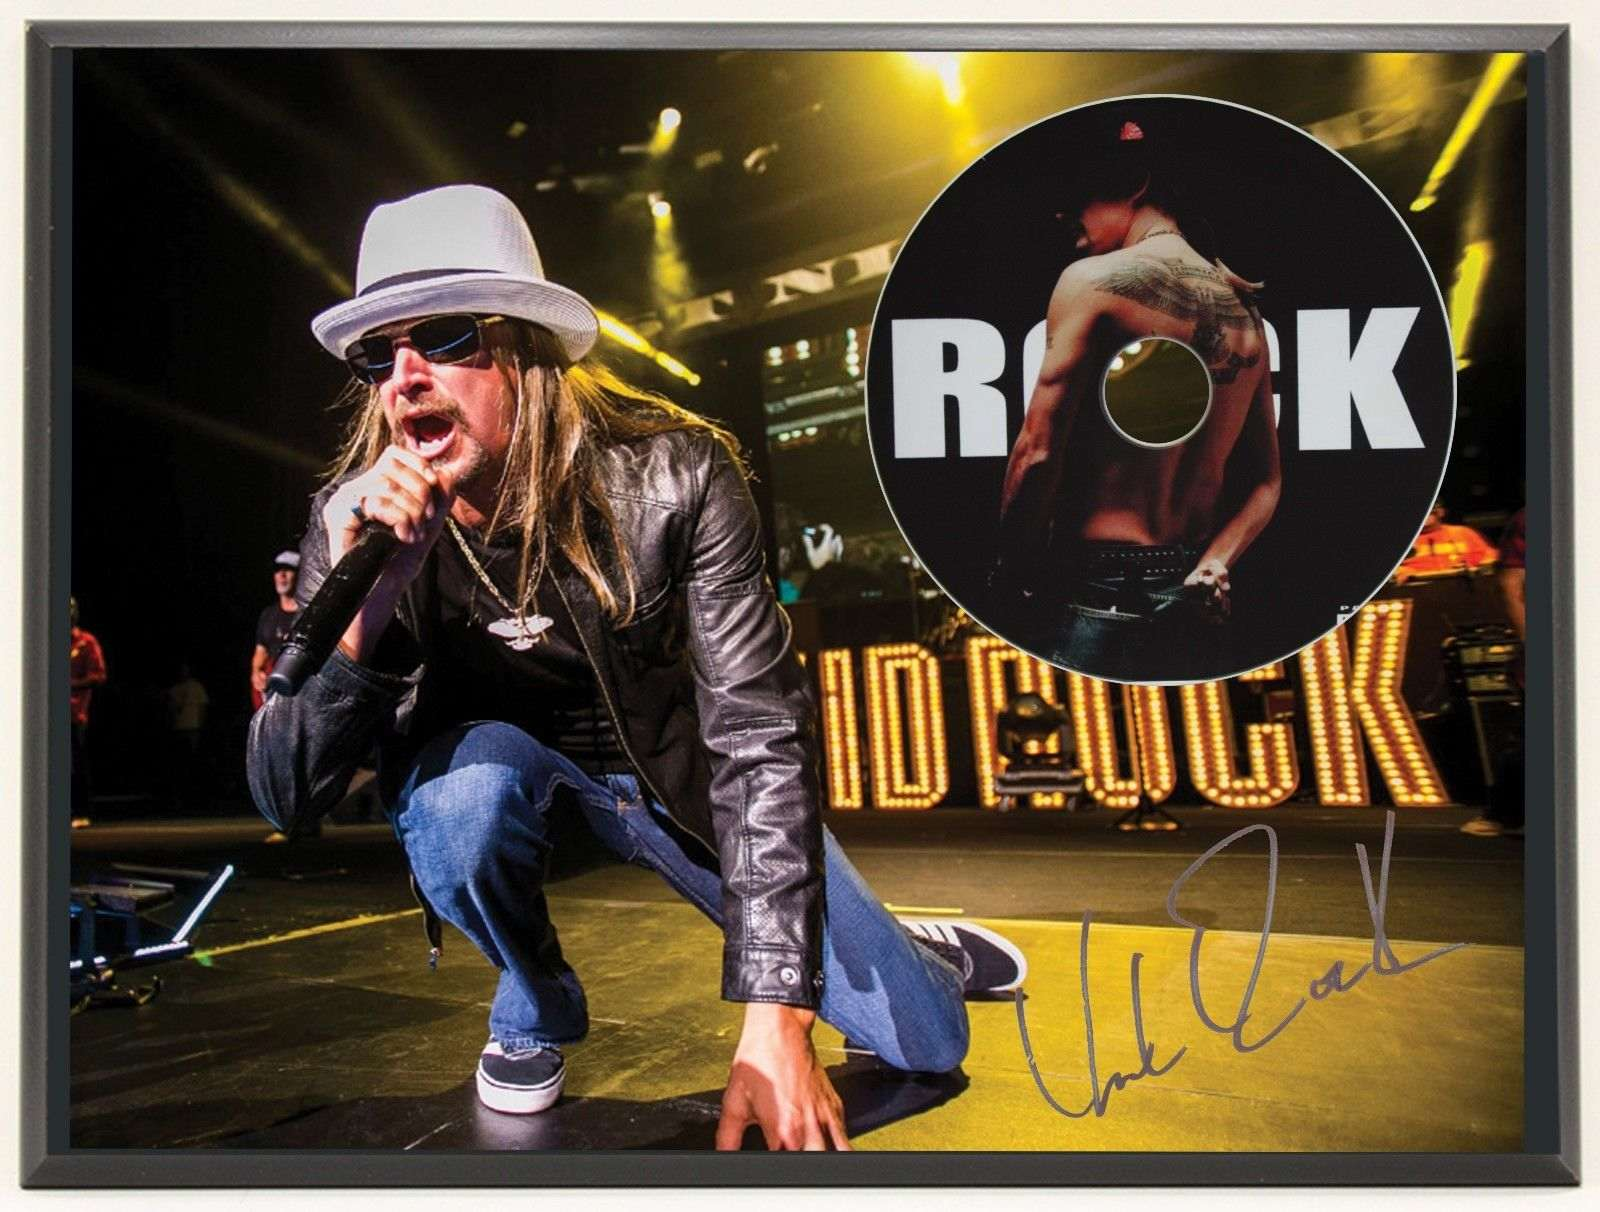 Kid Rock Ltd Edition Signature Series Picture Cd Display